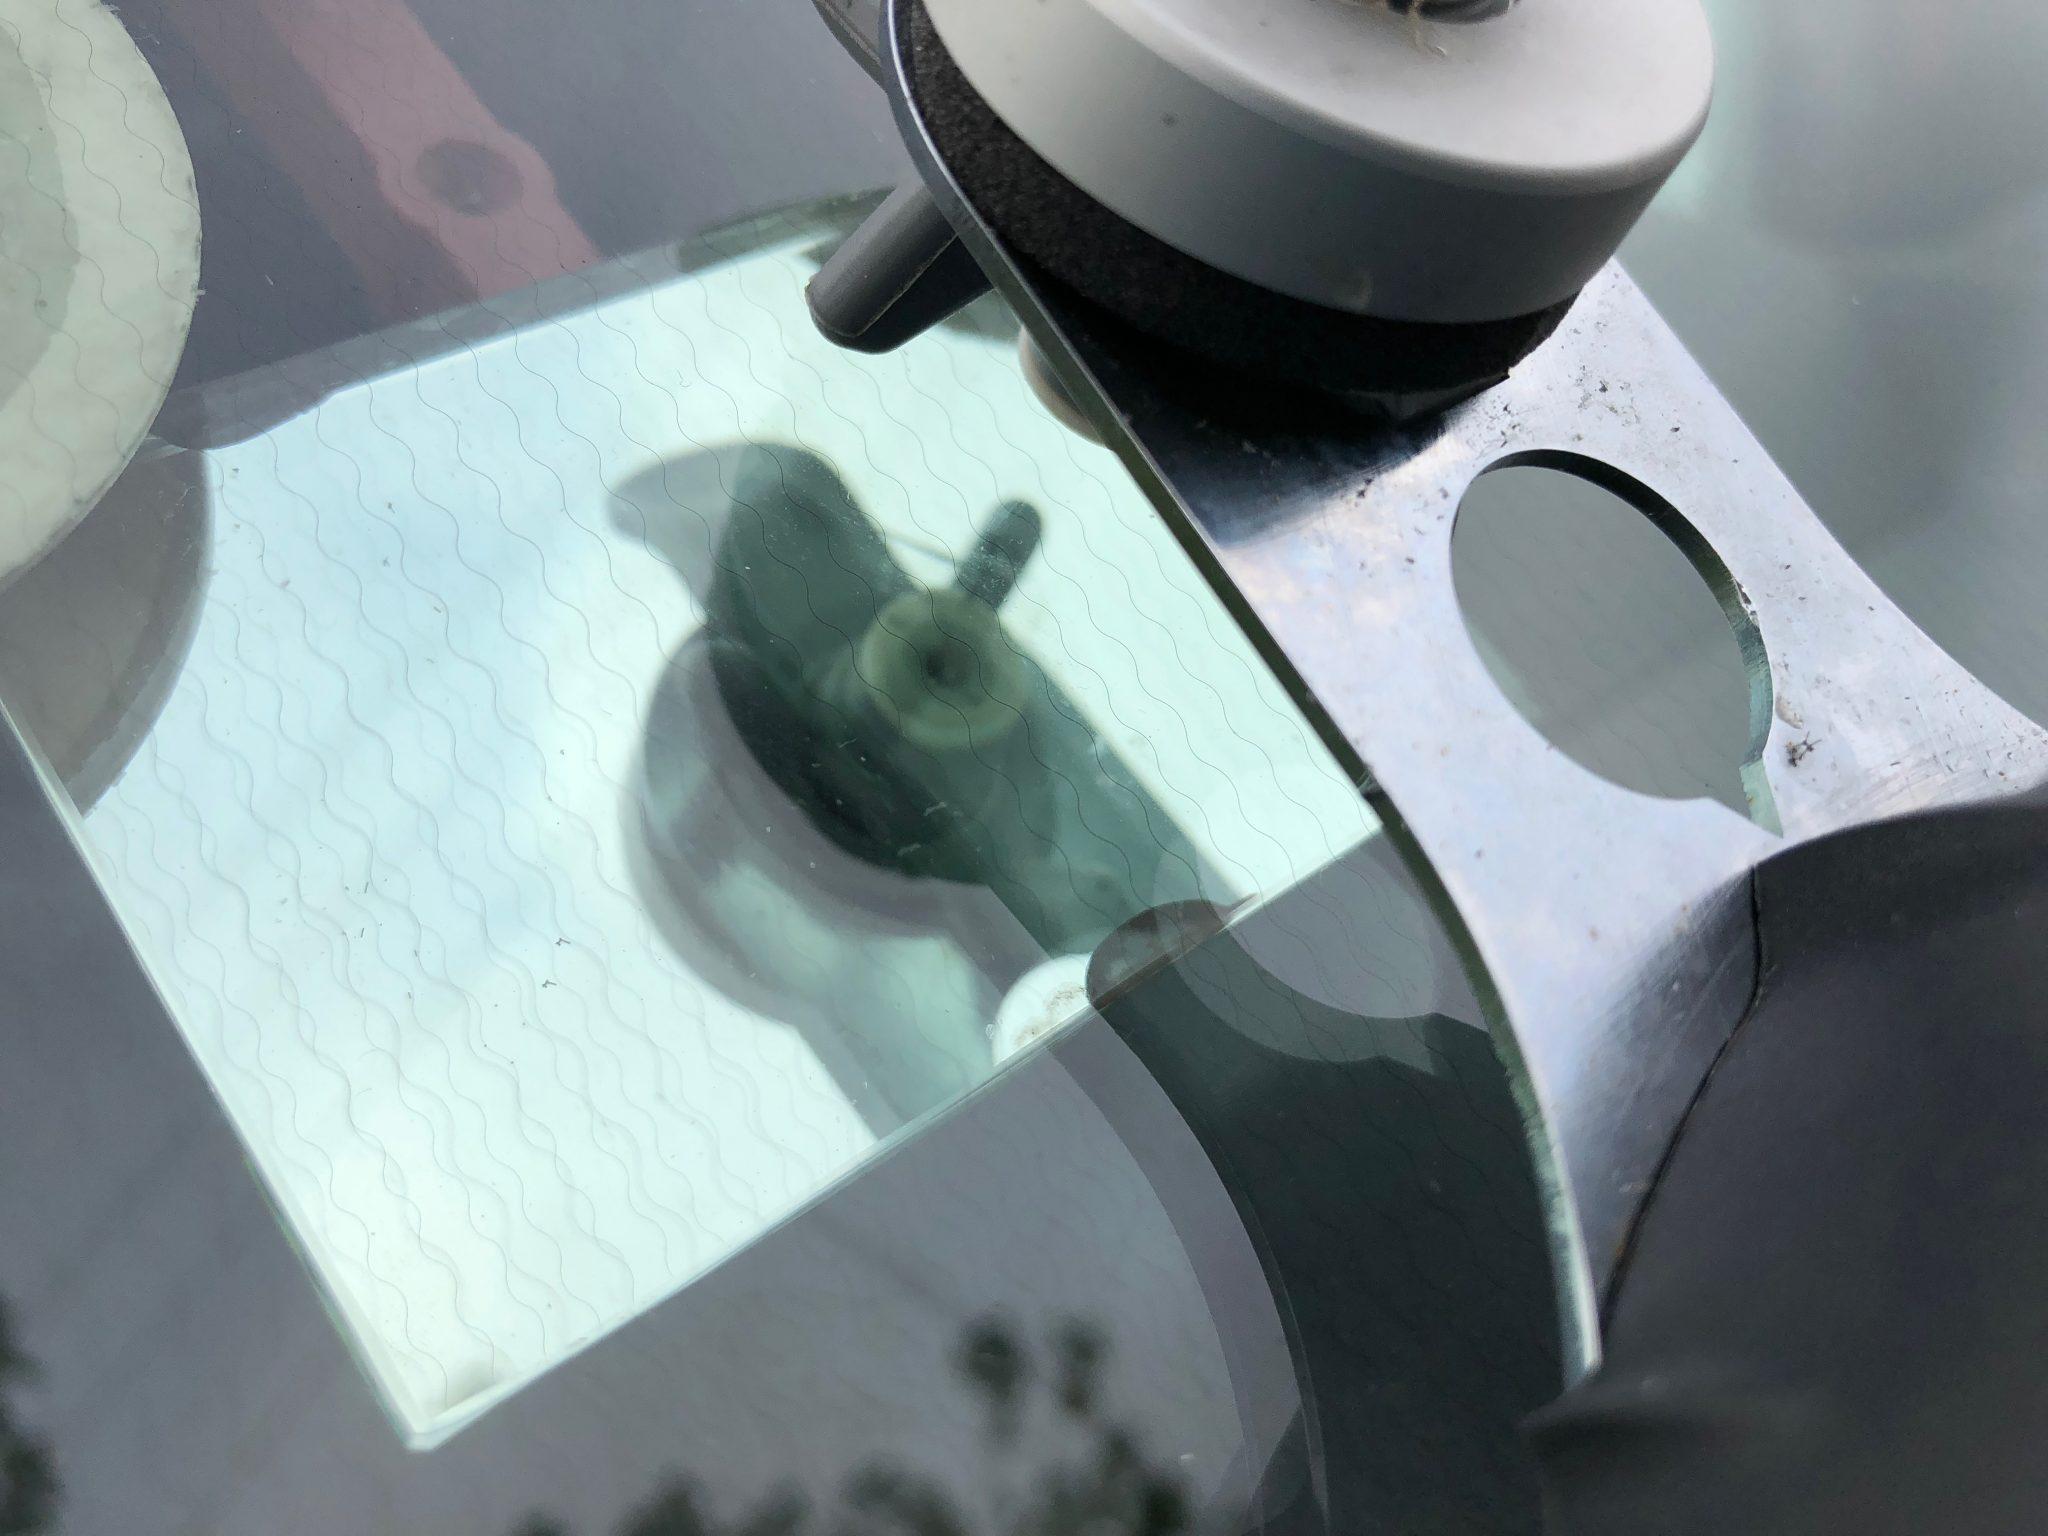 New Transit Windscreen Chip Repair